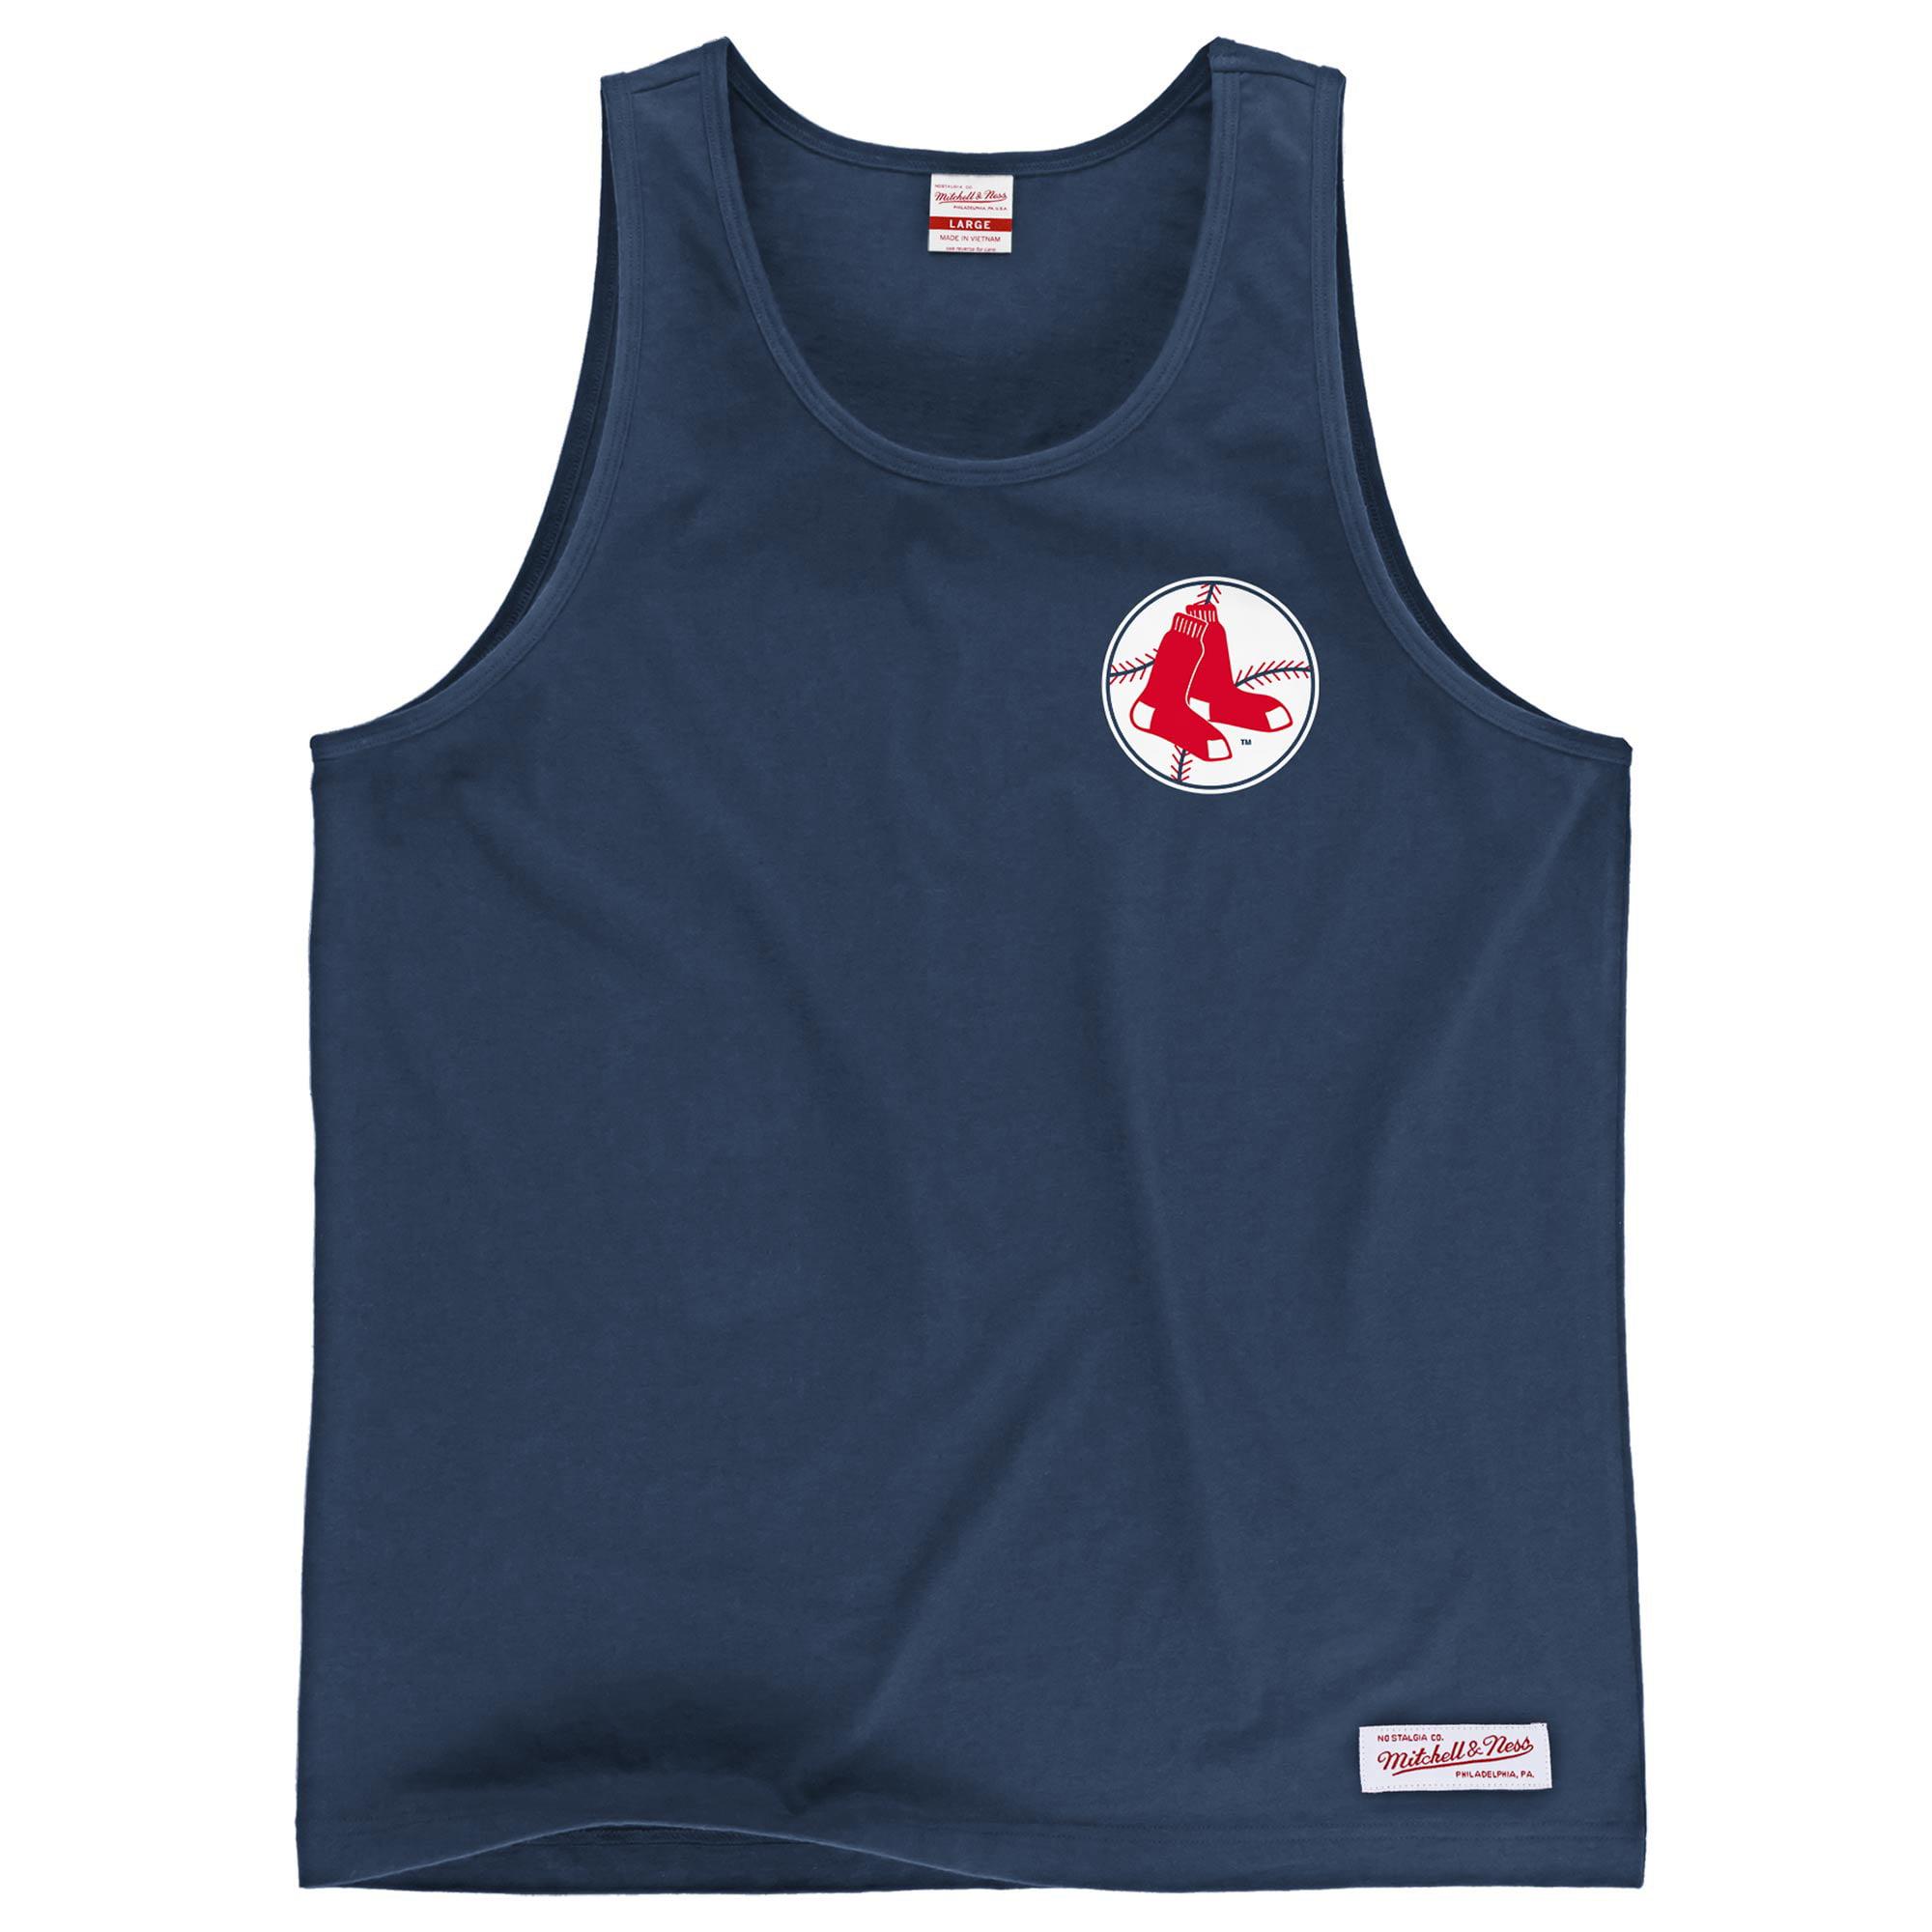 Boston Red Sox Mitchell & Ness Batter's Box Tank Top - Navy